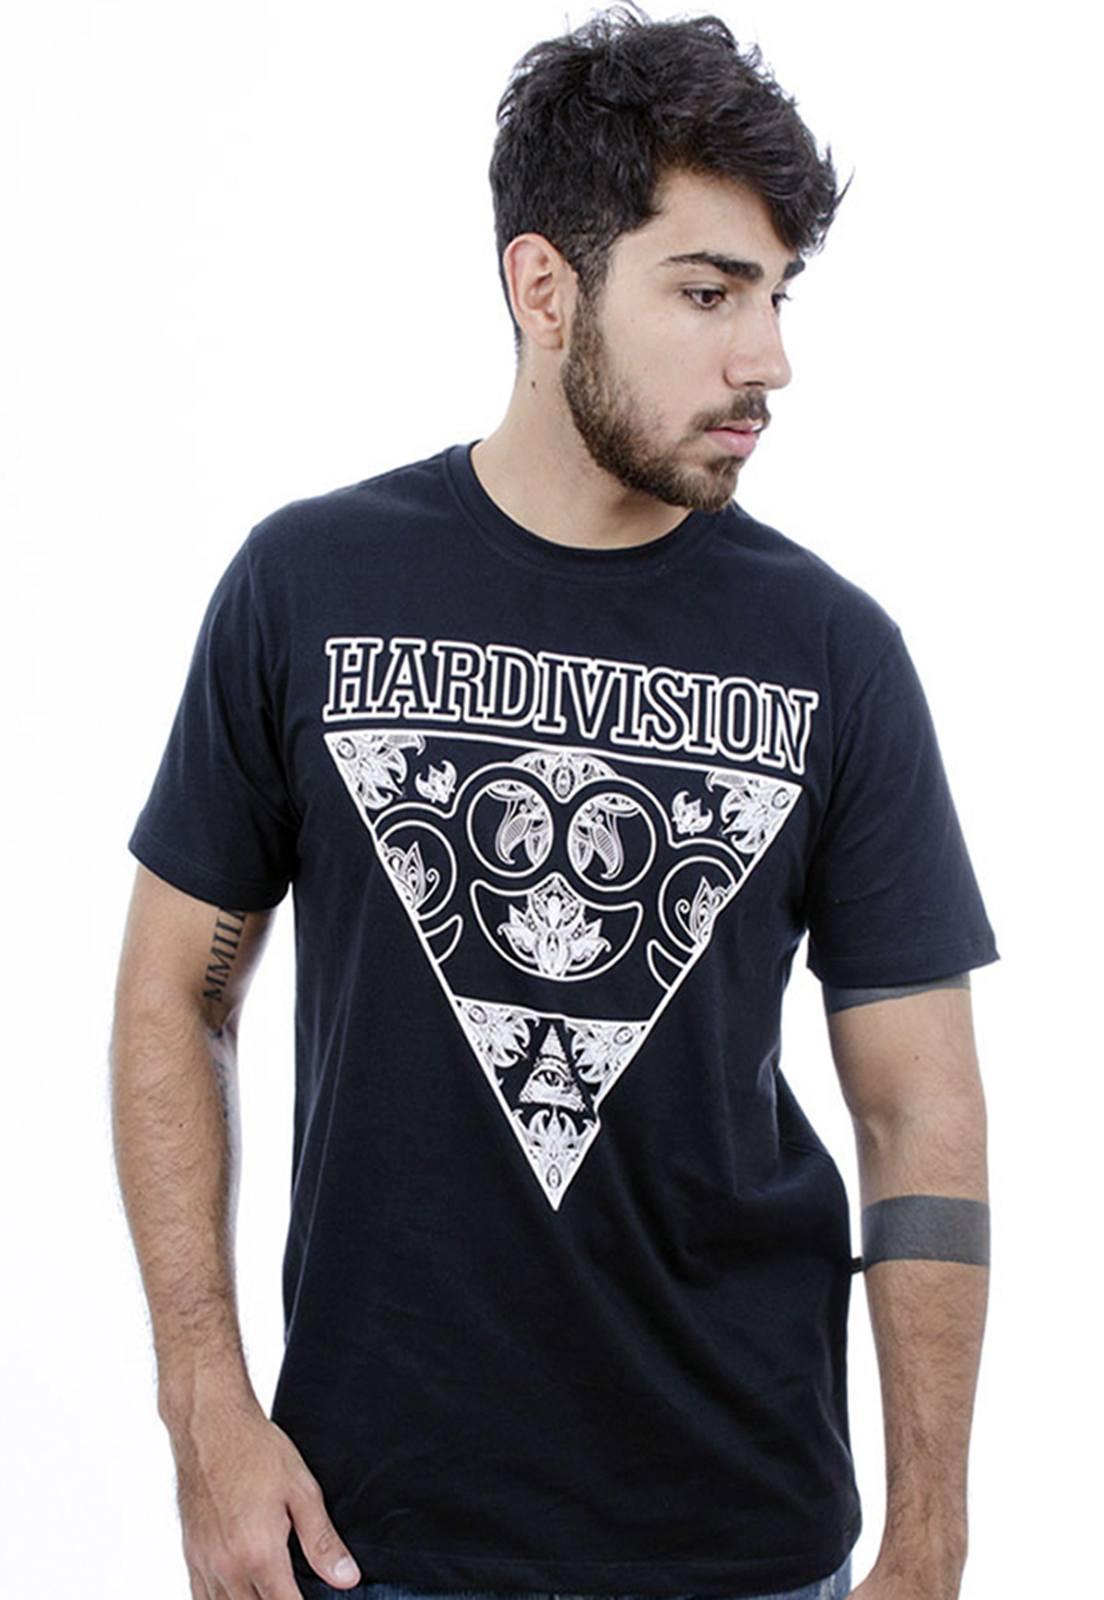 Camiseta Hardivision Skateboarder Manga Curta Preto